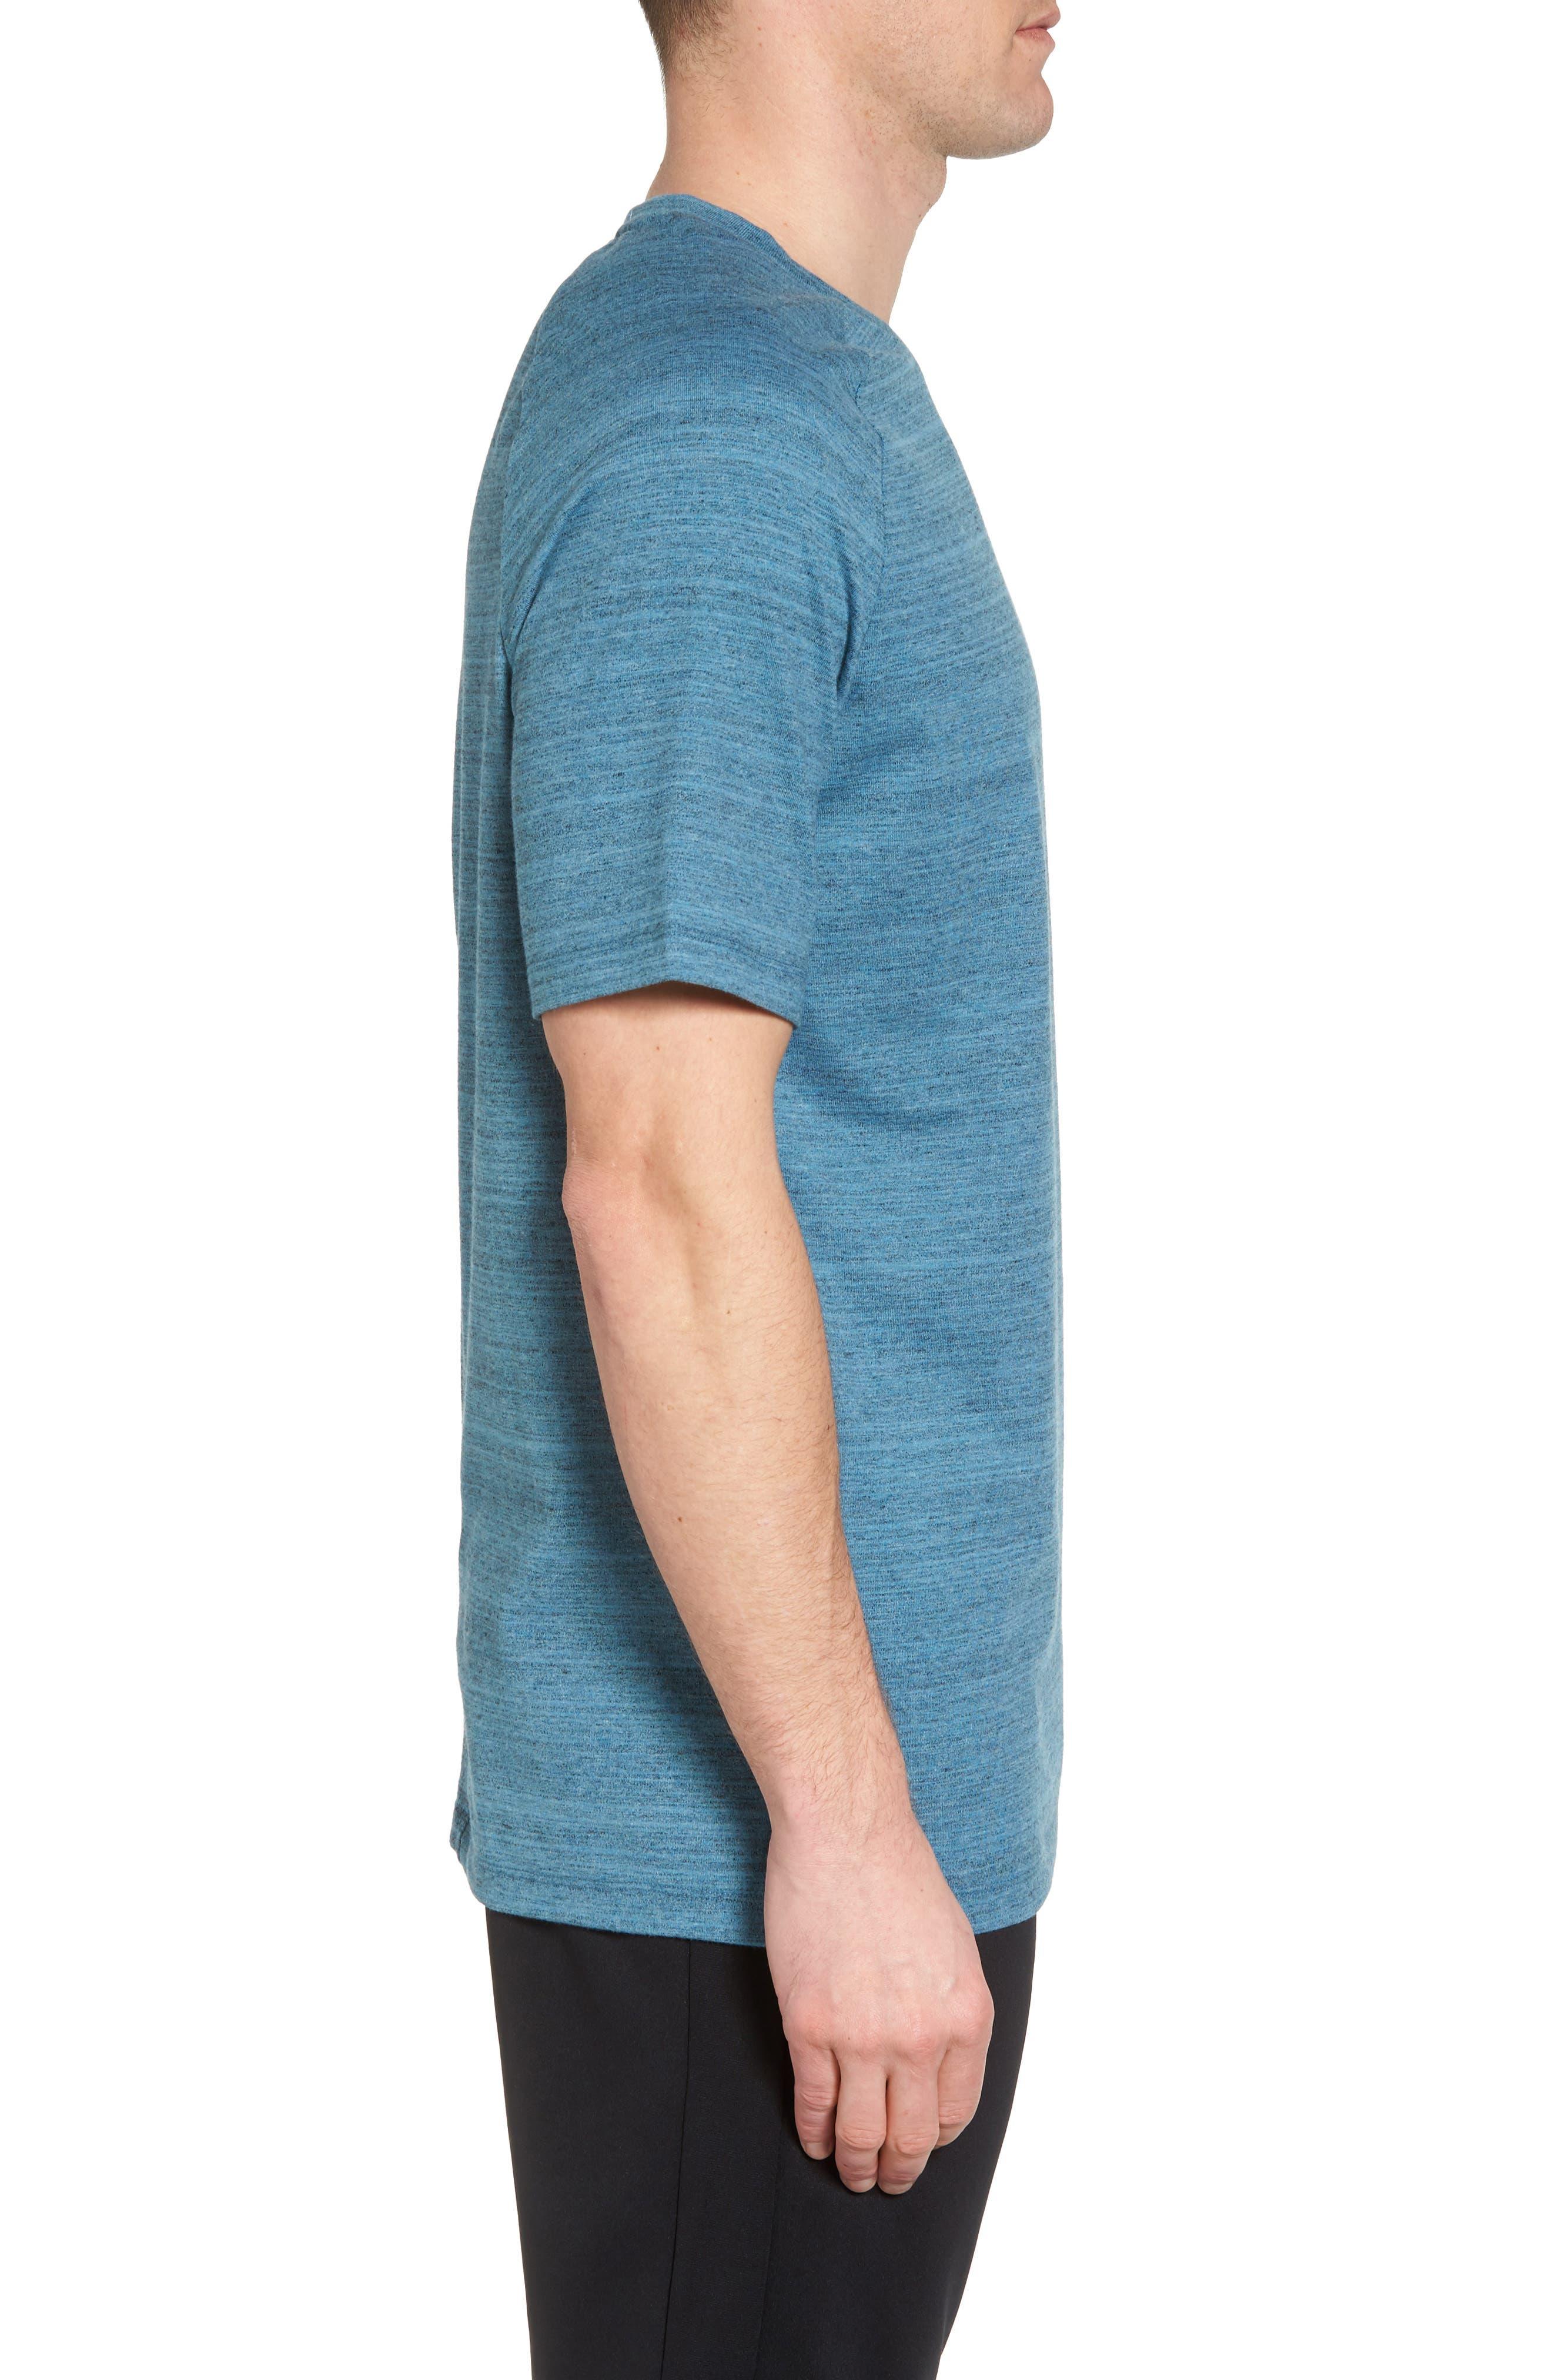 NSW AV15 Crewneck T-Shirt,                             Alternate thumbnail 3, color,                             NOISE AQUA/ HEATHER/ WHITE